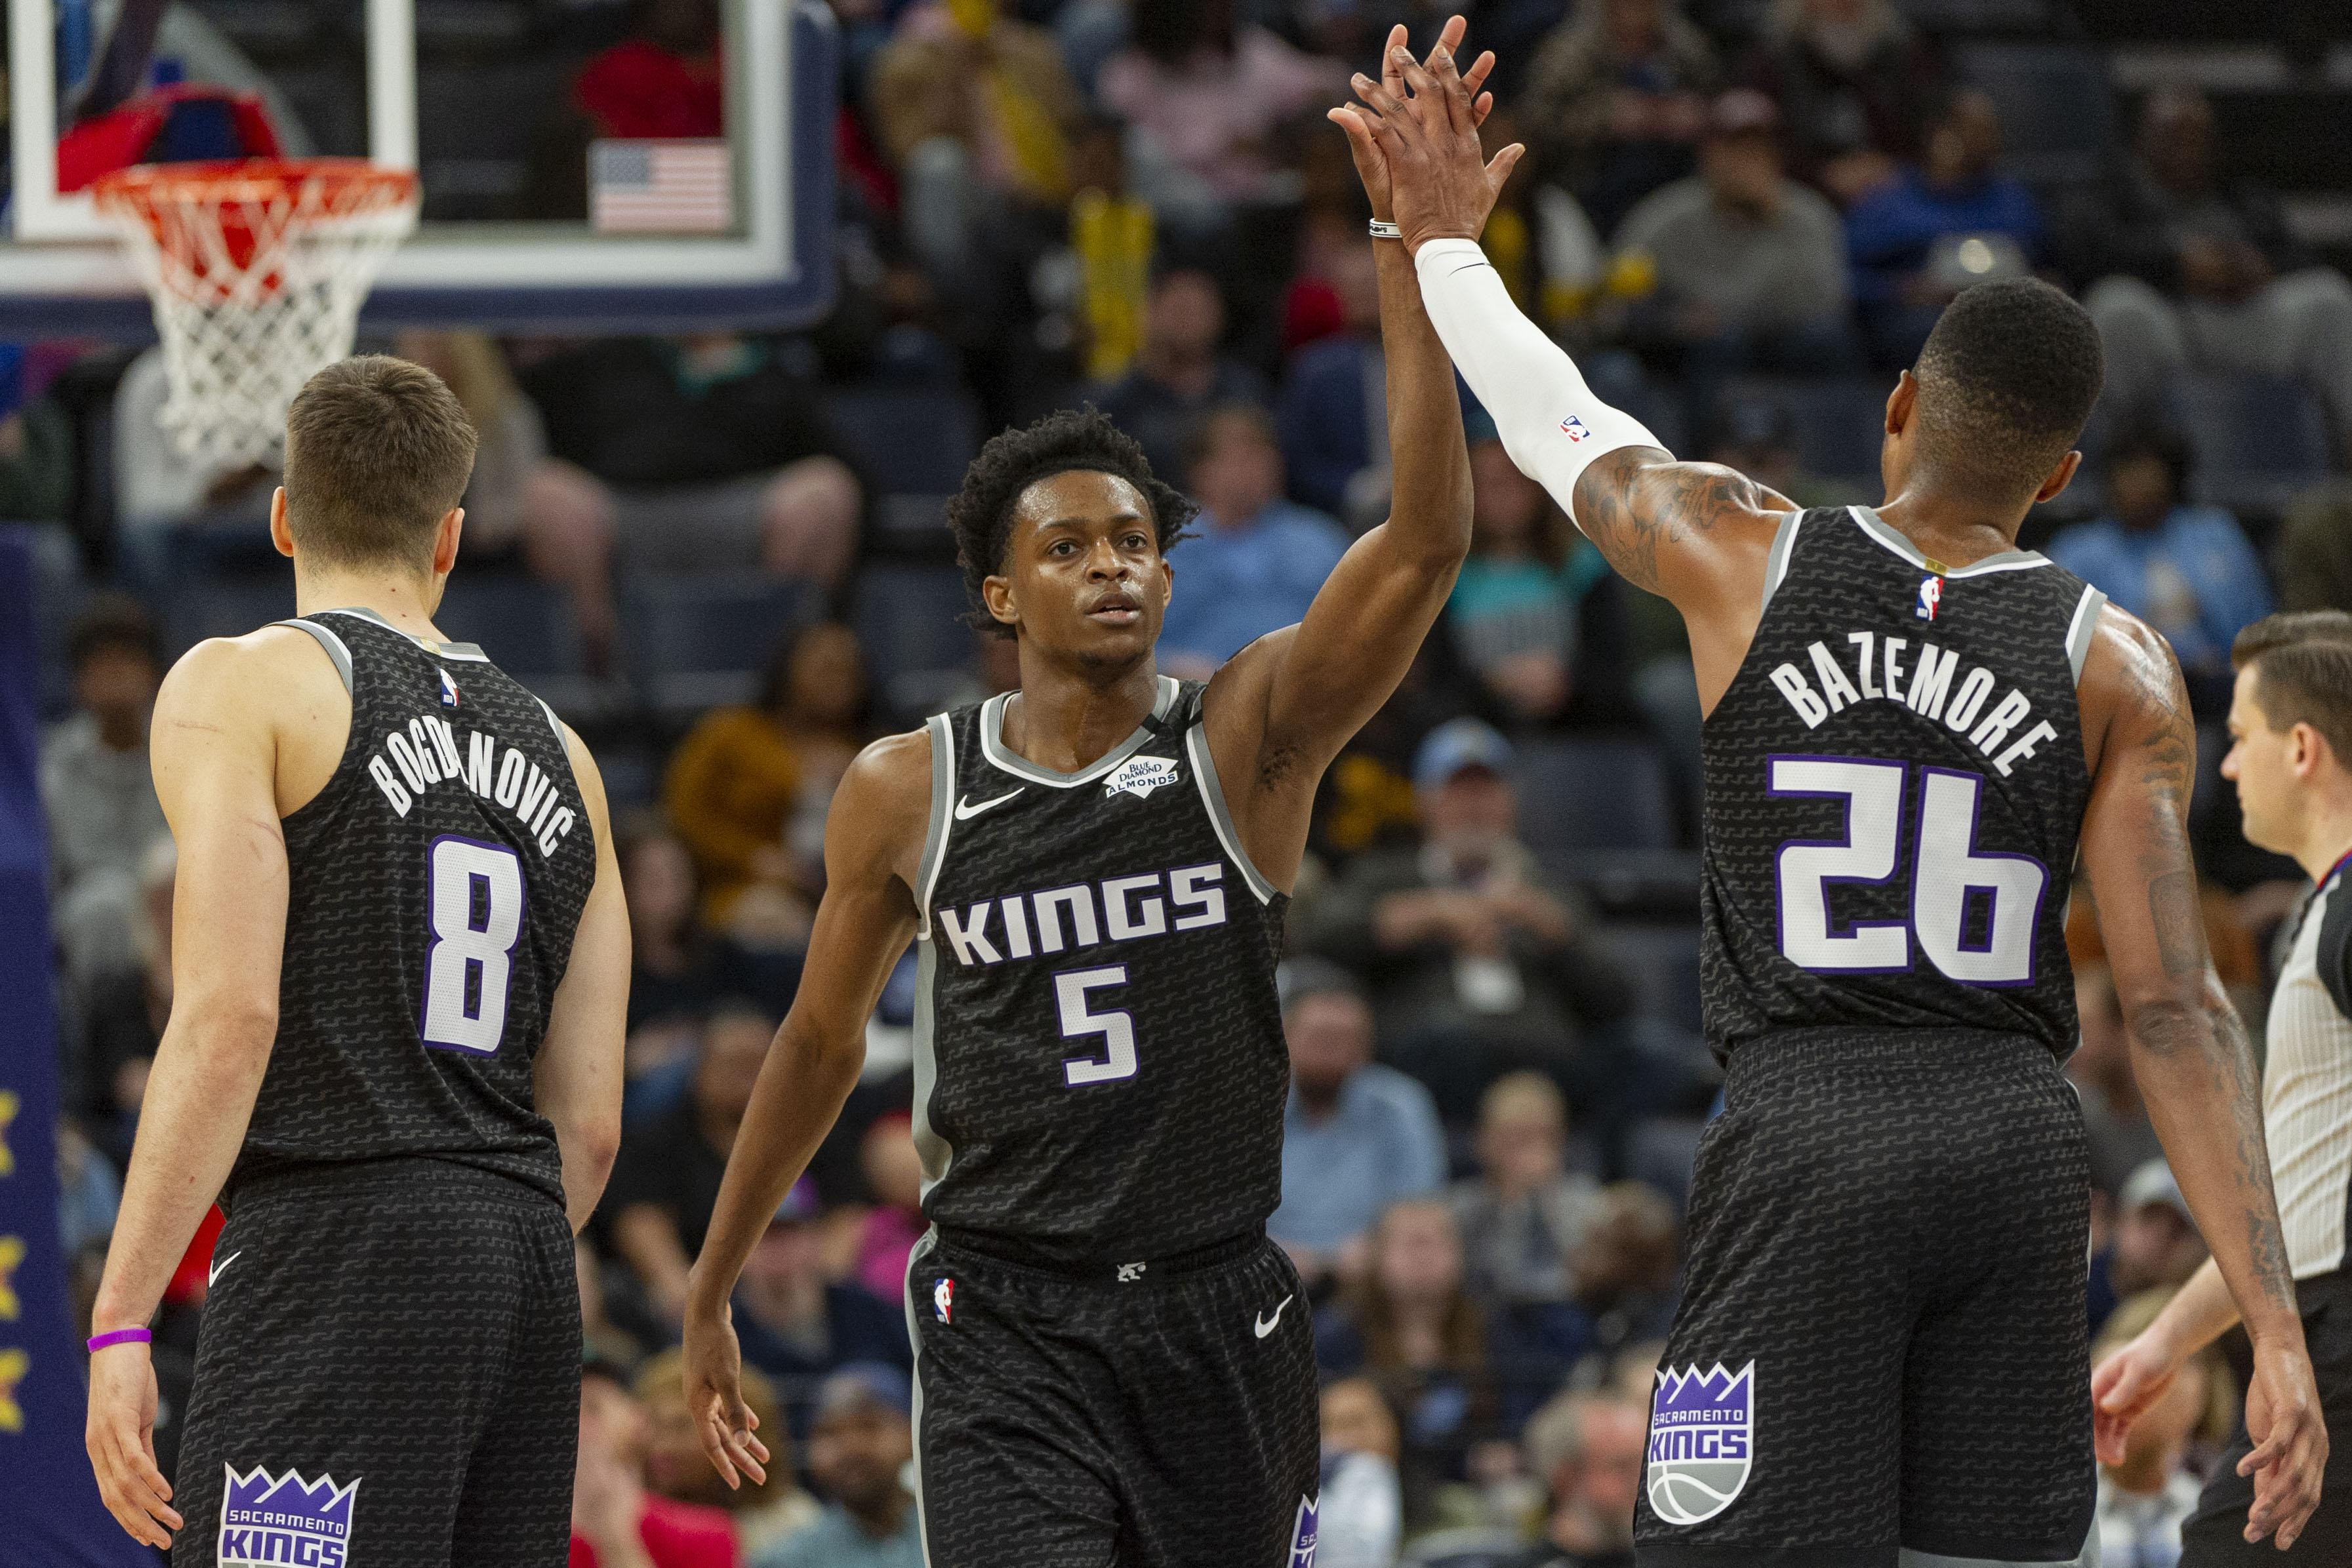 Sacramento Kings guard De'Aaron Fox and guard Kent Bazemore react during the second half against the Memphis Grizzlies at FedExForum.